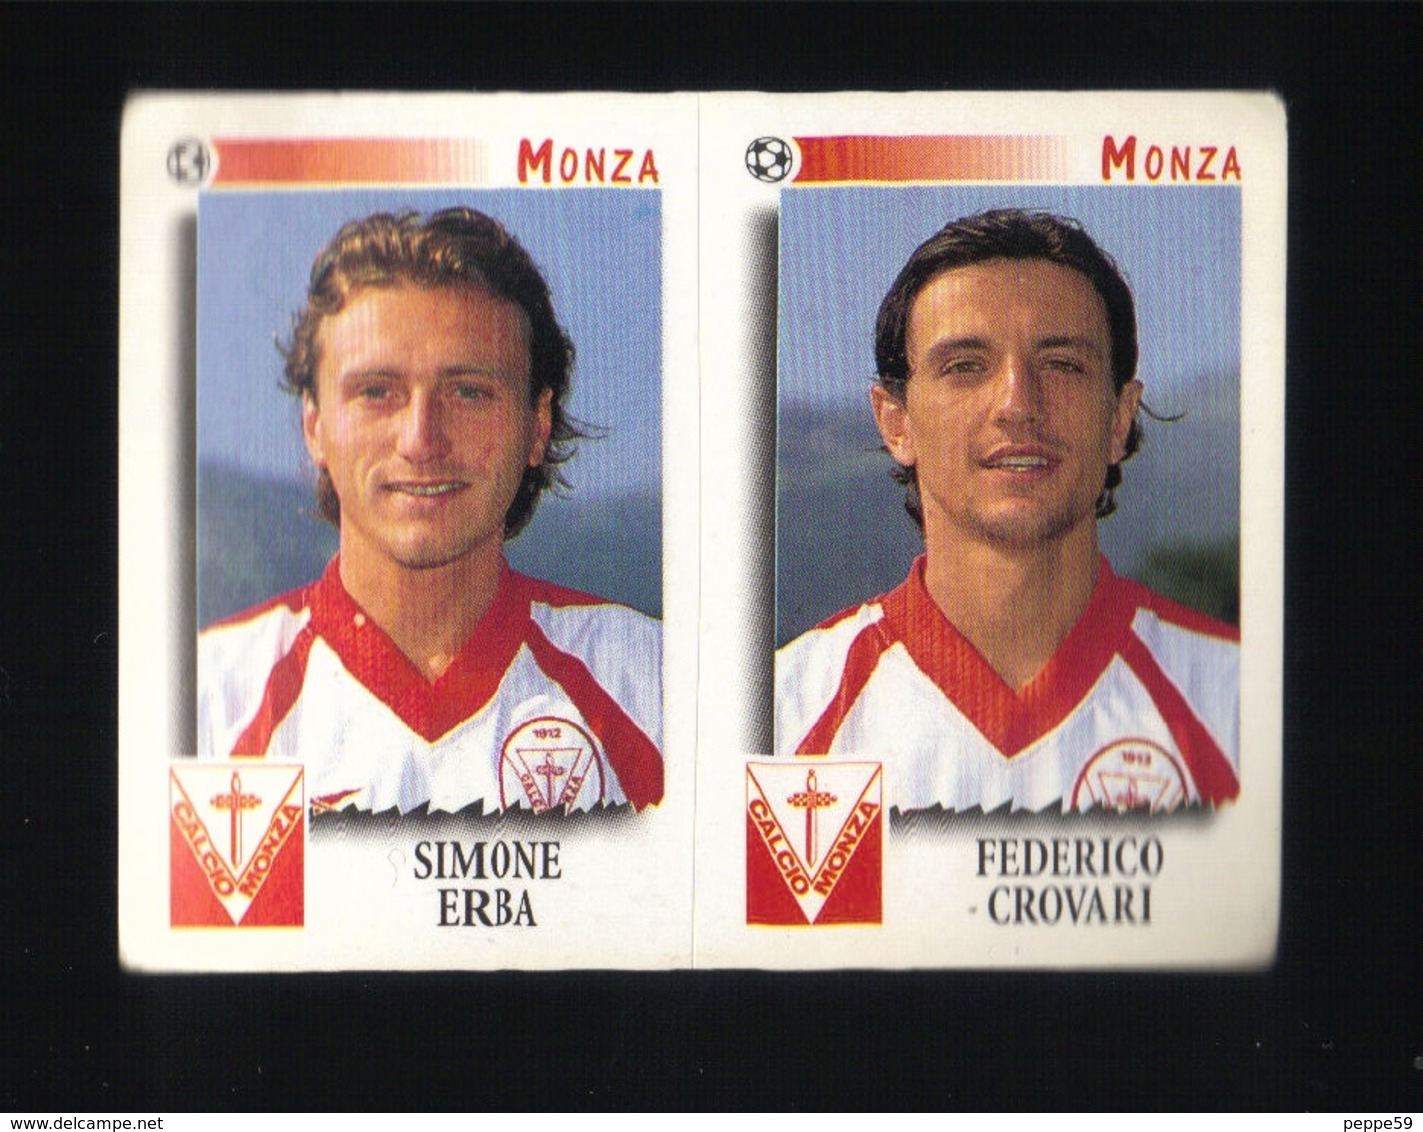 Figurina Calciatori Italiani Panini 1997-1998 - Monza  - N.496   - Football - Soccer - Socker - Fussball - Futbol - Edizione Italiana